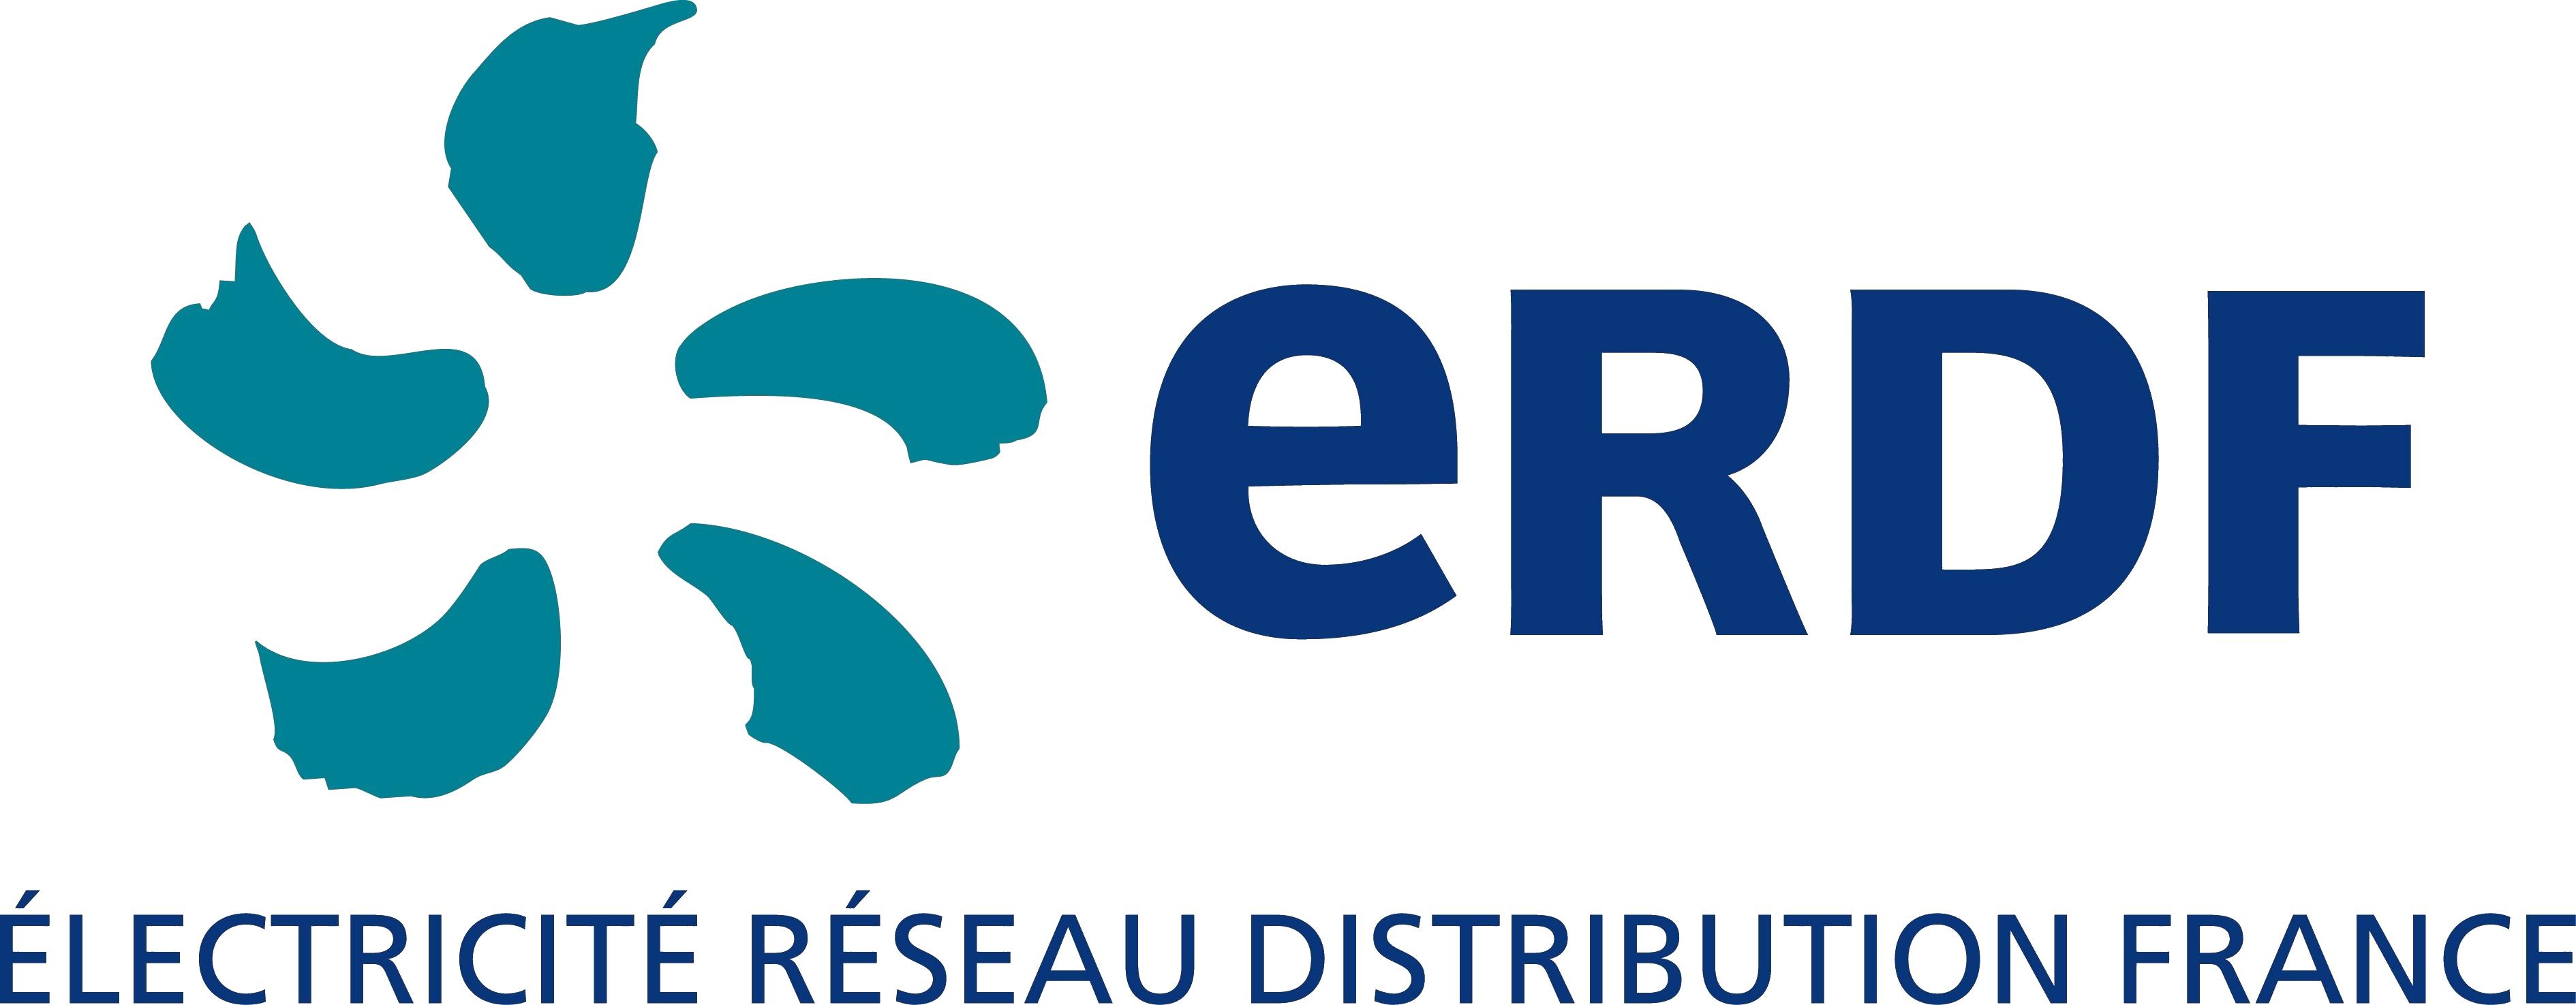 image logo erdf